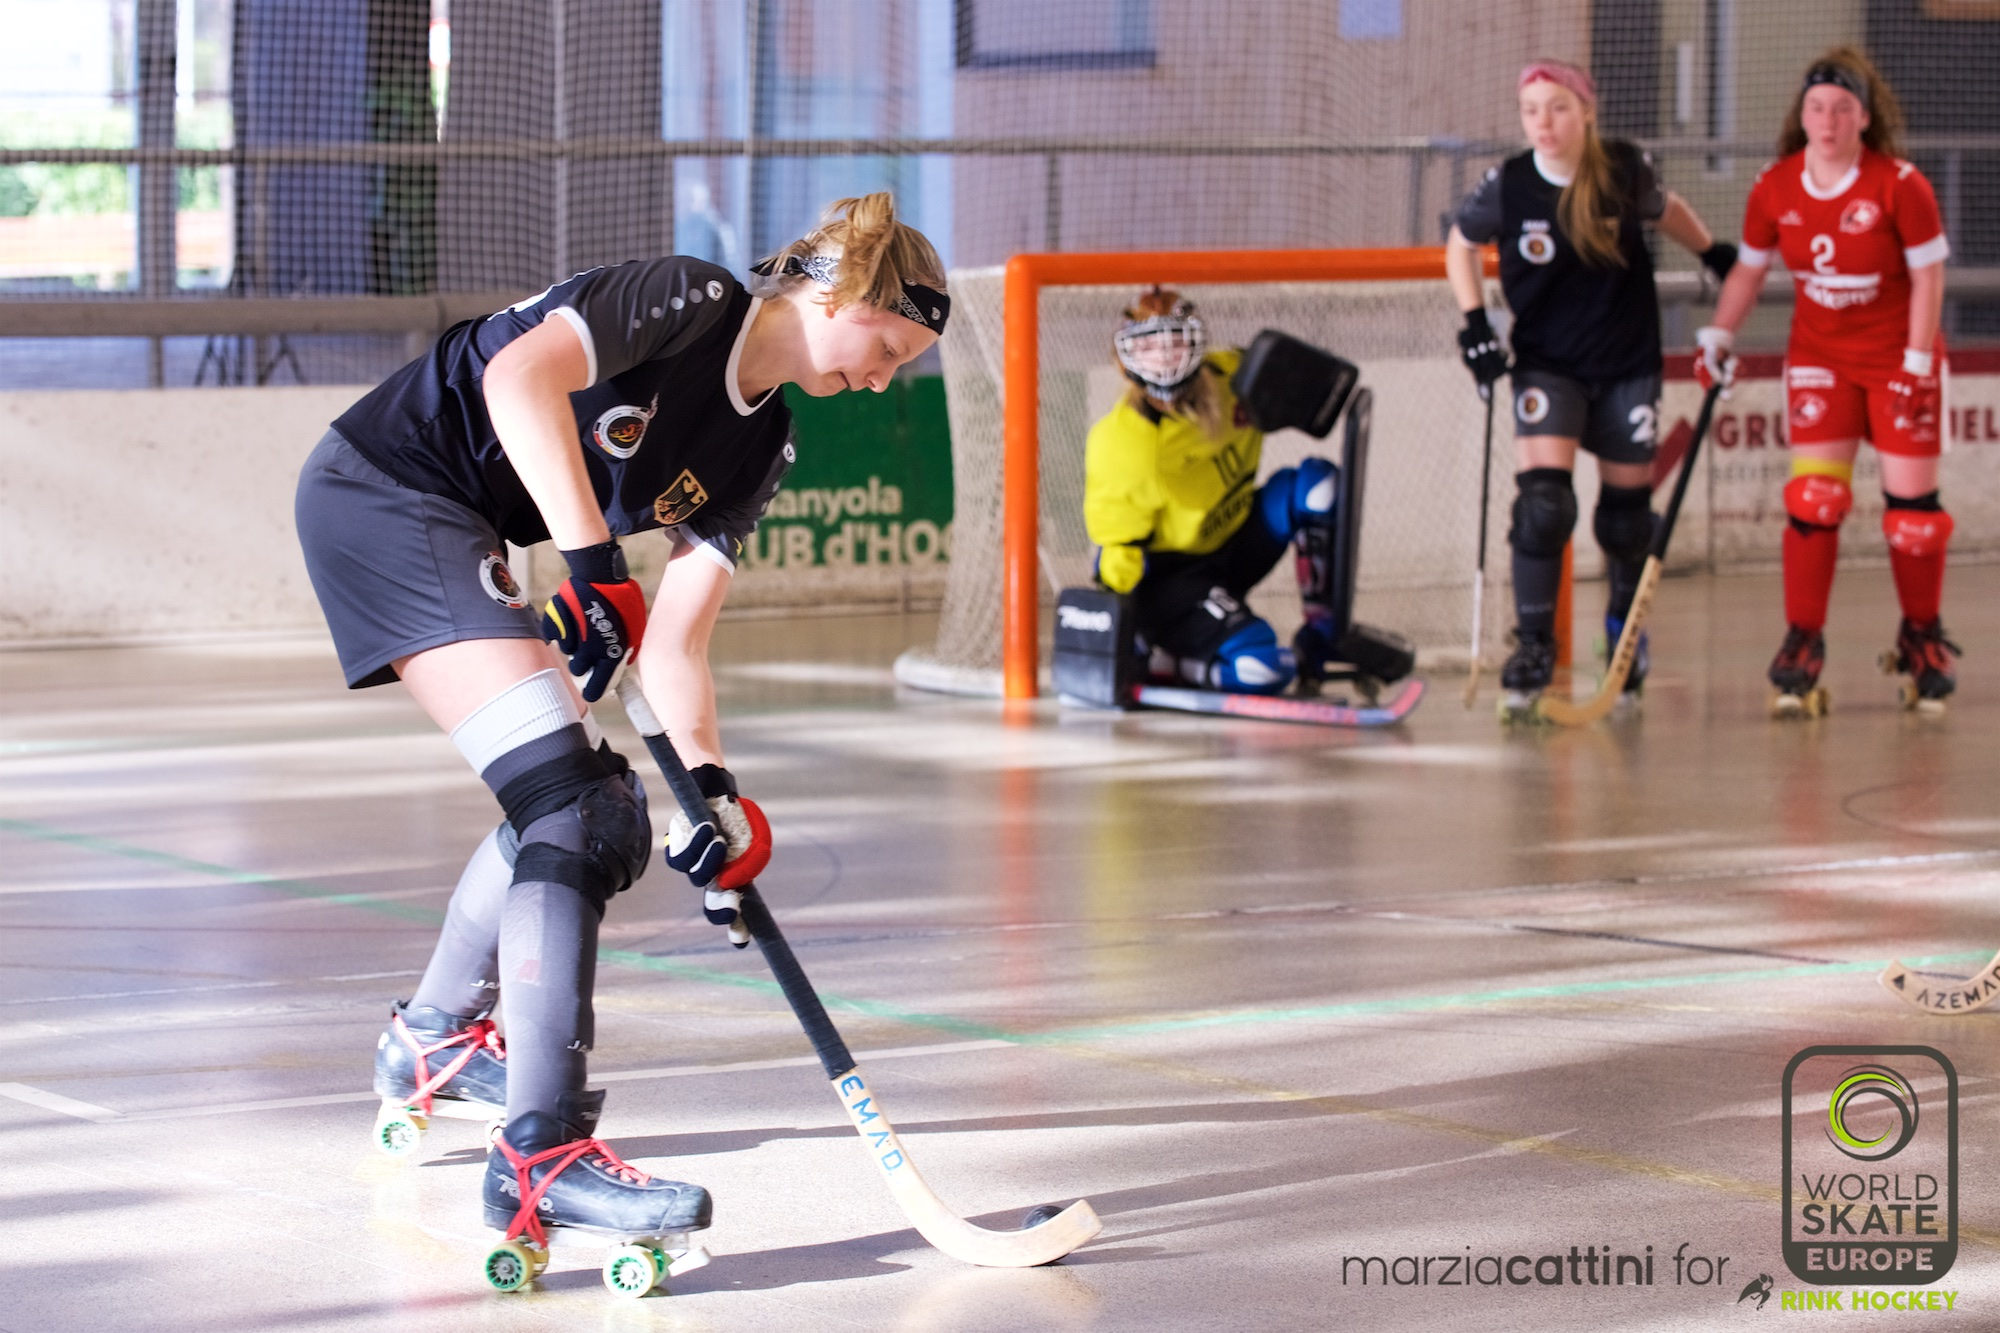 PHOTOS - 15/12/2018 - JIMENO'S CUP - Match #14 – Swiss Future (CH) x Eagle Team (DE)